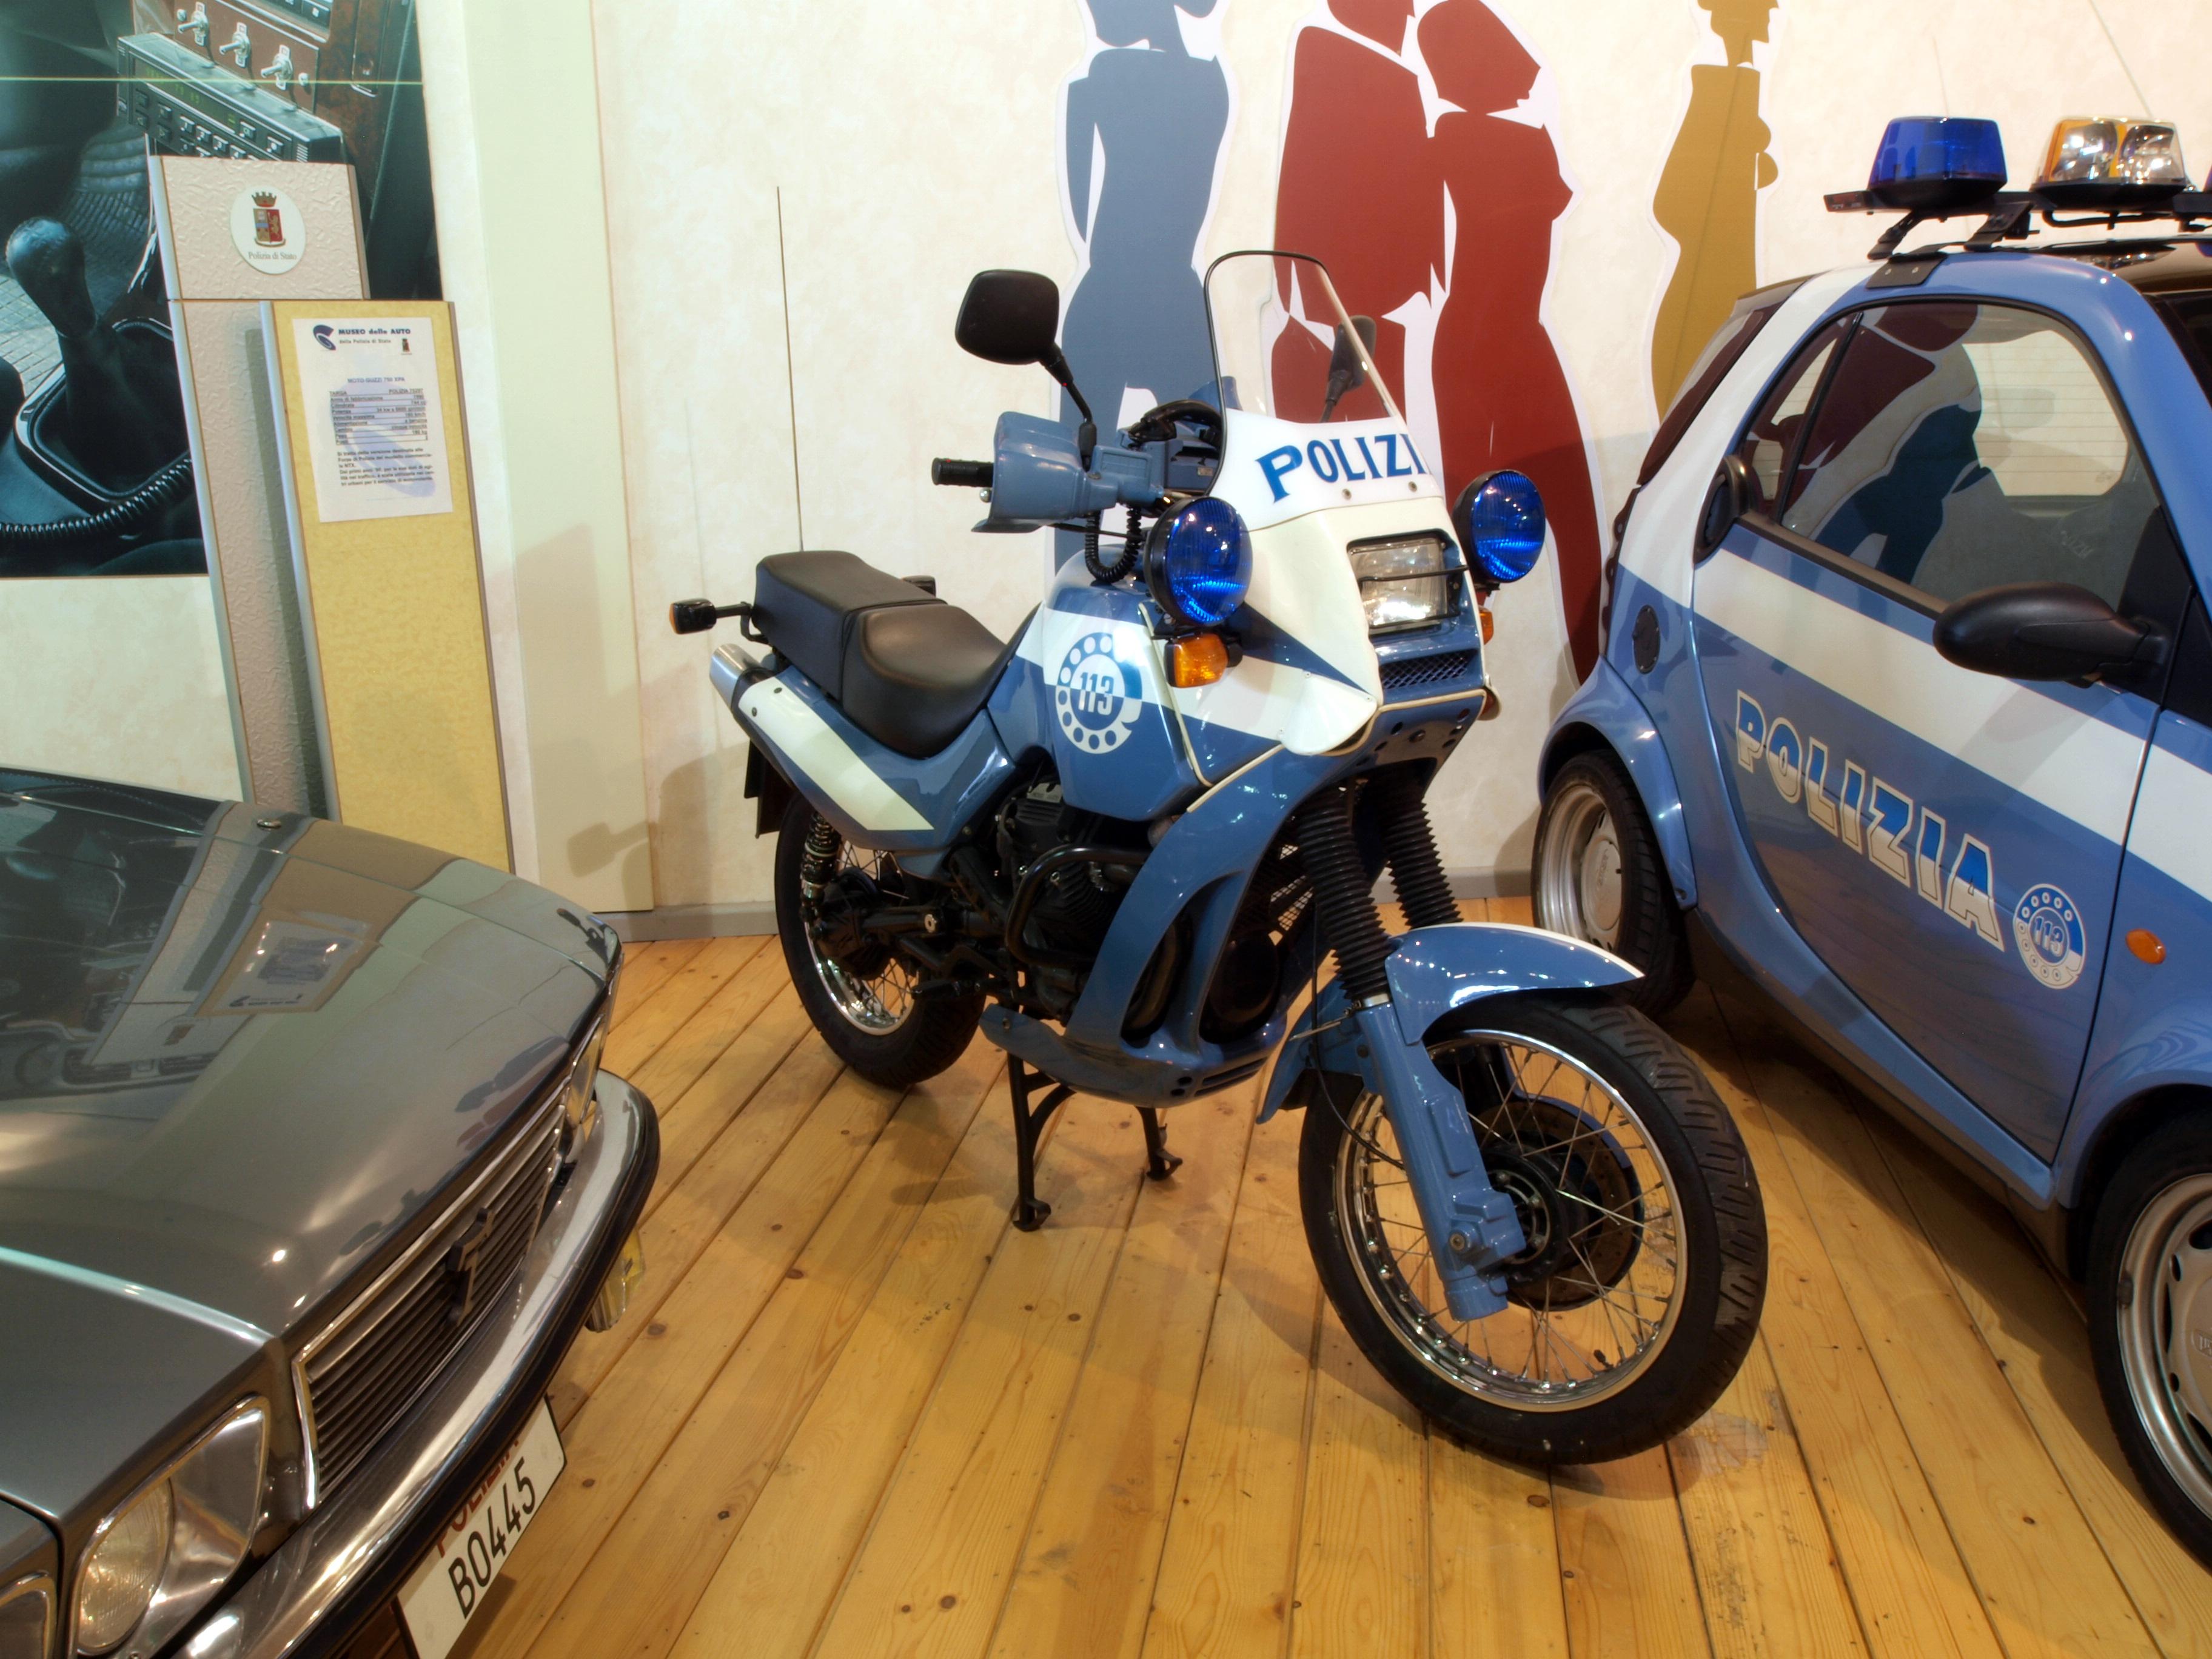 Oddbike Moto Guzzi V Twin Off Roaders Improbable Italian Enduros Engine Diagram Image Source